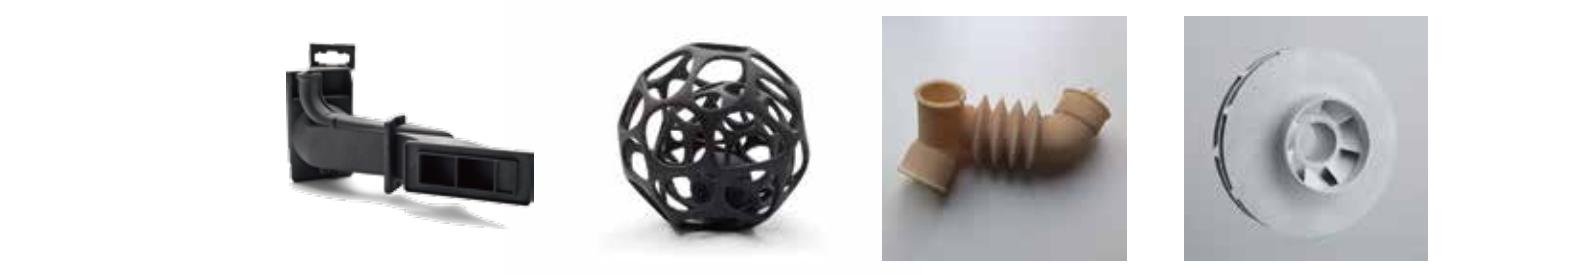 3D列印技術專家普立得,從3D列印代工、3D列印耗材、3D逆向掃描提供一系列3D列印機關服務,在醫療、電子、航太各領域提供高品質產品。